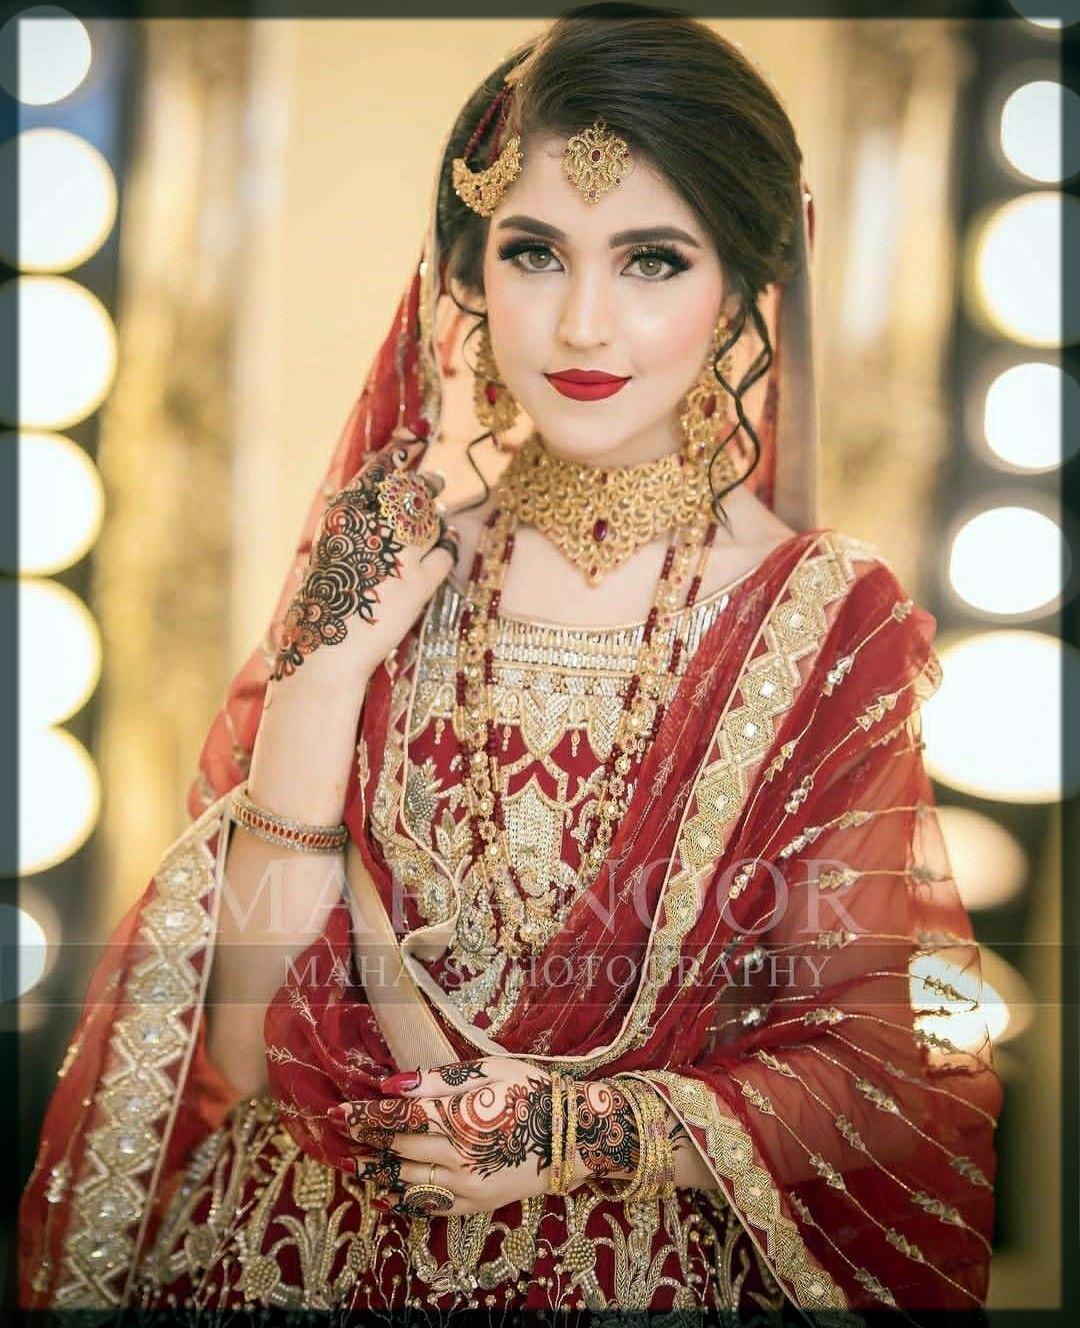 bridal barat day makeup ideas